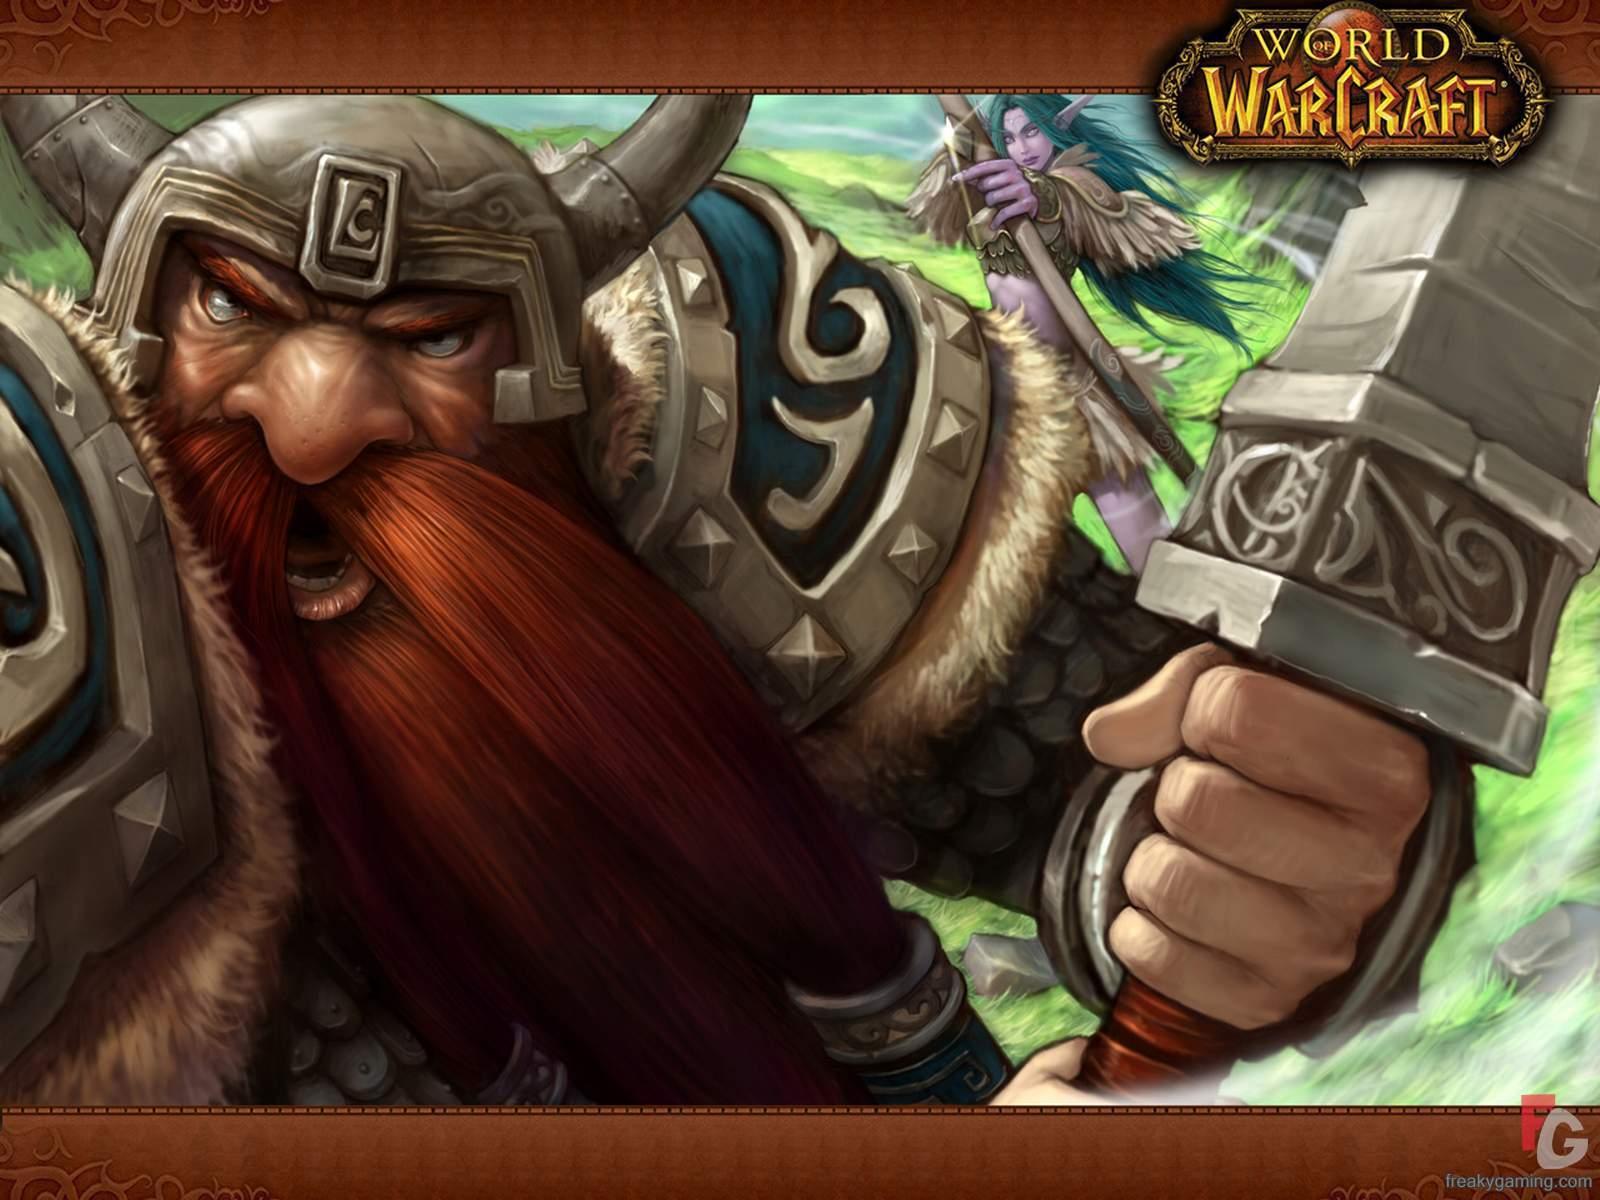 http://2.bp.blogspot.com/-GZUgSIO-Yho/TjE1mLmjlpI/AAAAAAAAACE/CmV3XTU-xUM/s1600/dwarf_warrior.jpg